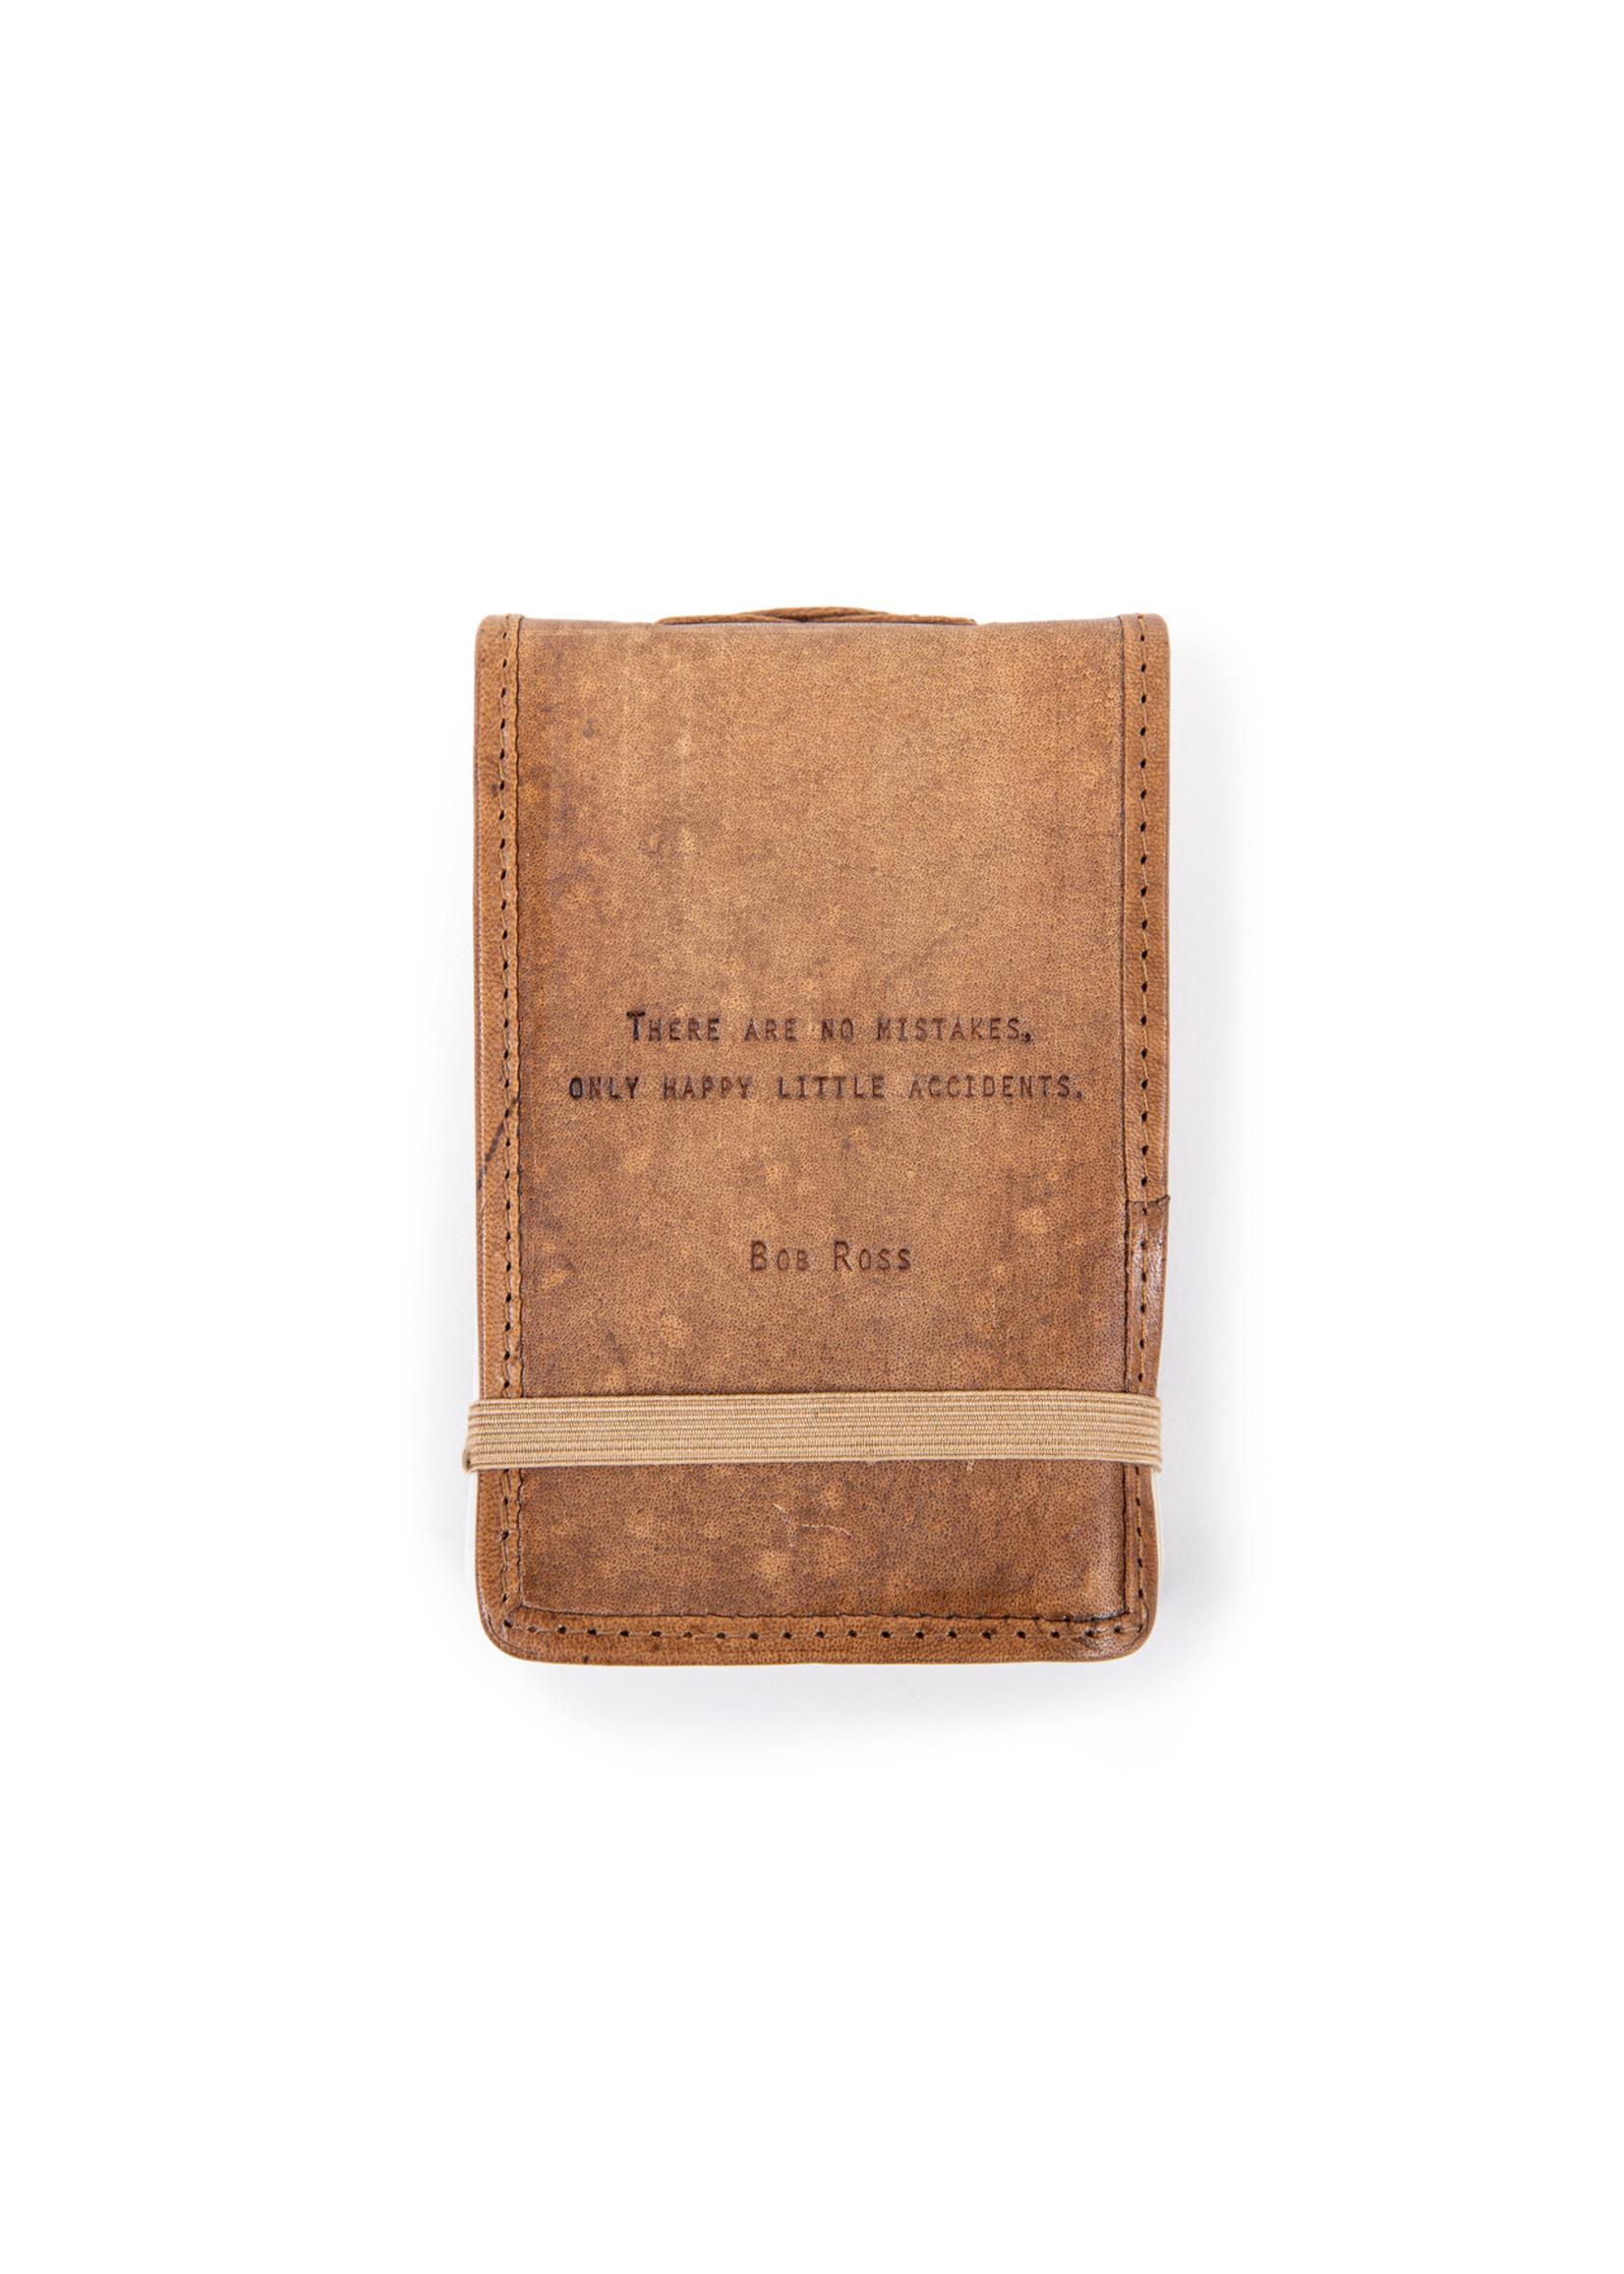 Sugarboo Mini Leather Journal - Bob Ross (4x6)